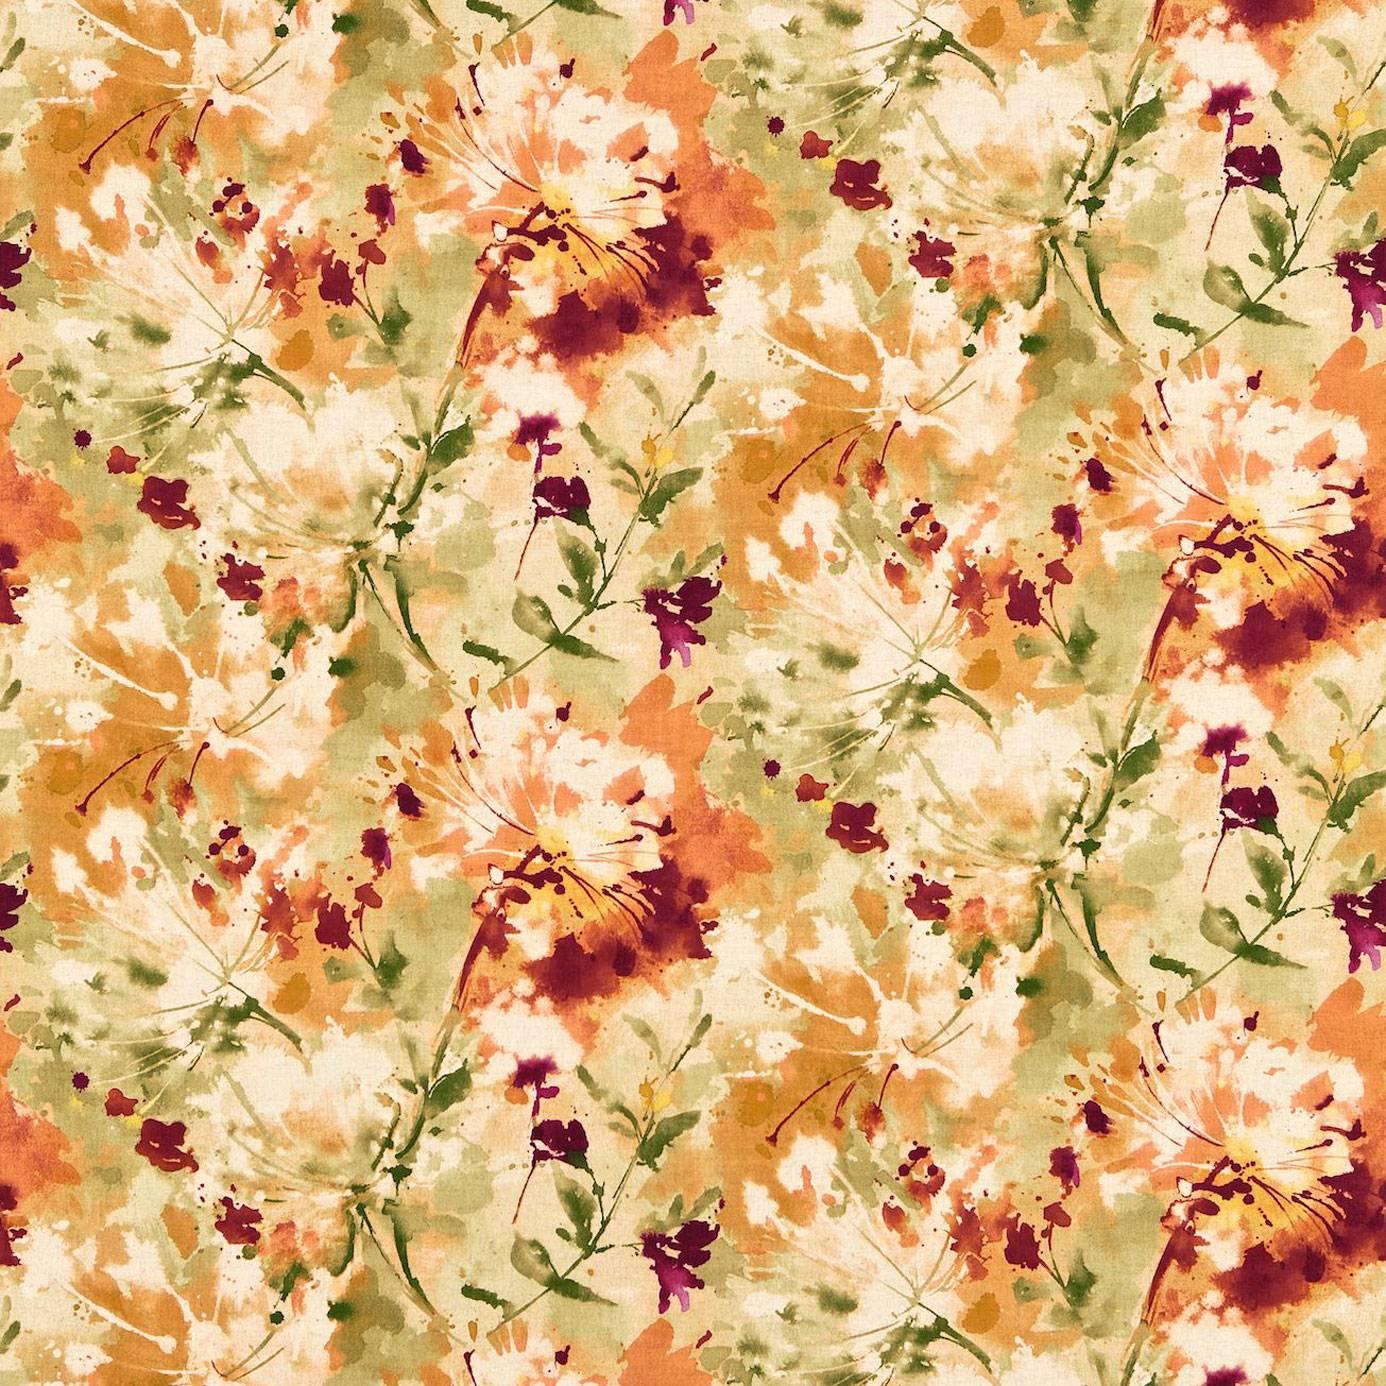 simi fabric copper 222952 sanderson aegean fabrics. Black Bedroom Furniture Sets. Home Design Ideas